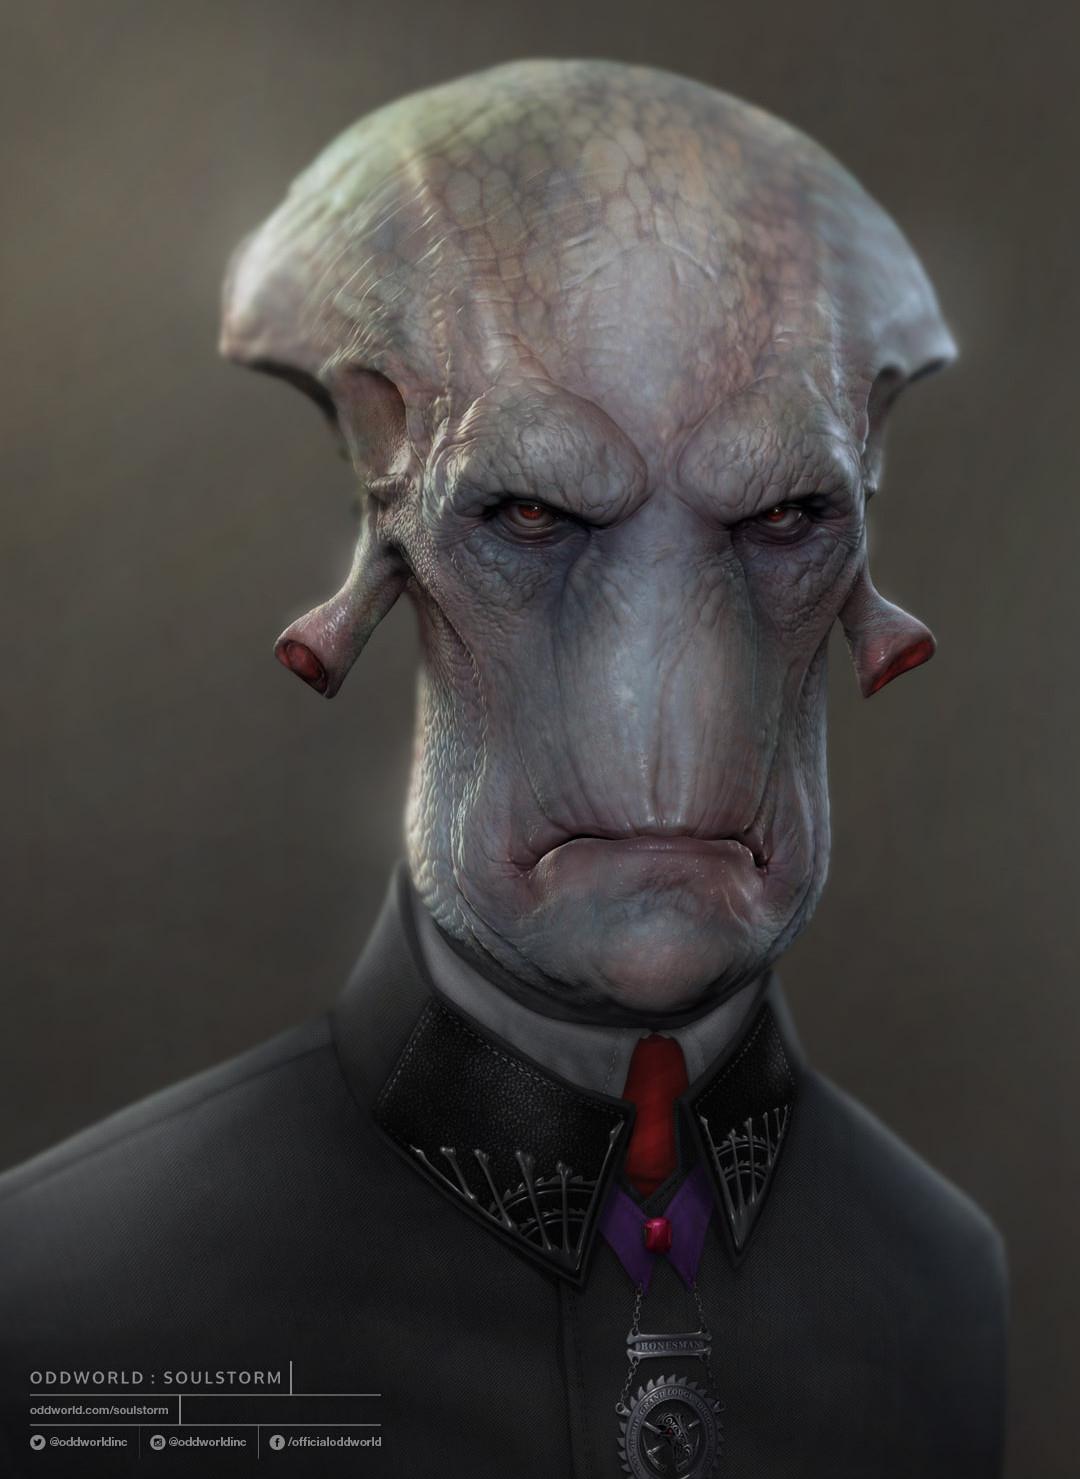 Oddworld Soulstorm character portraits, Glukkon 2